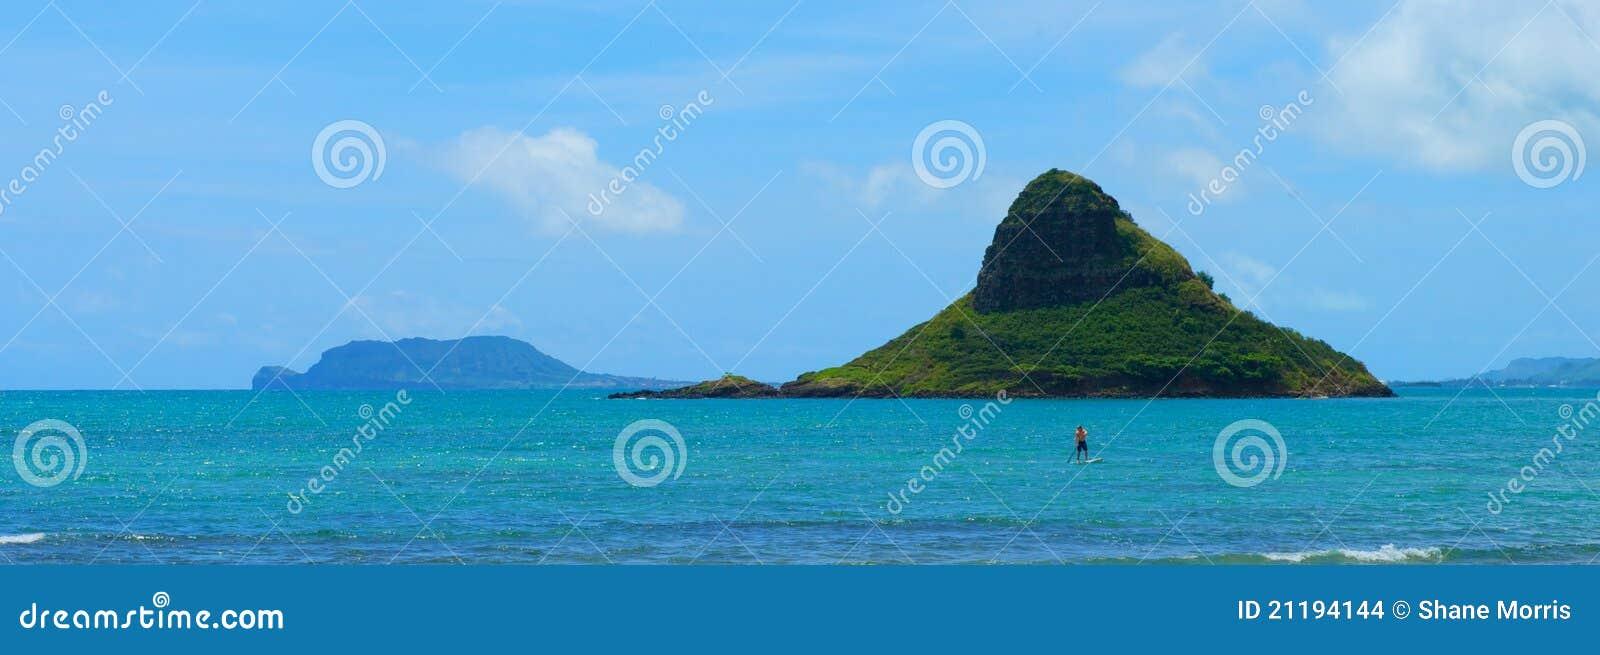 Rock Formation Off the Coast of Ohau, Hawaii